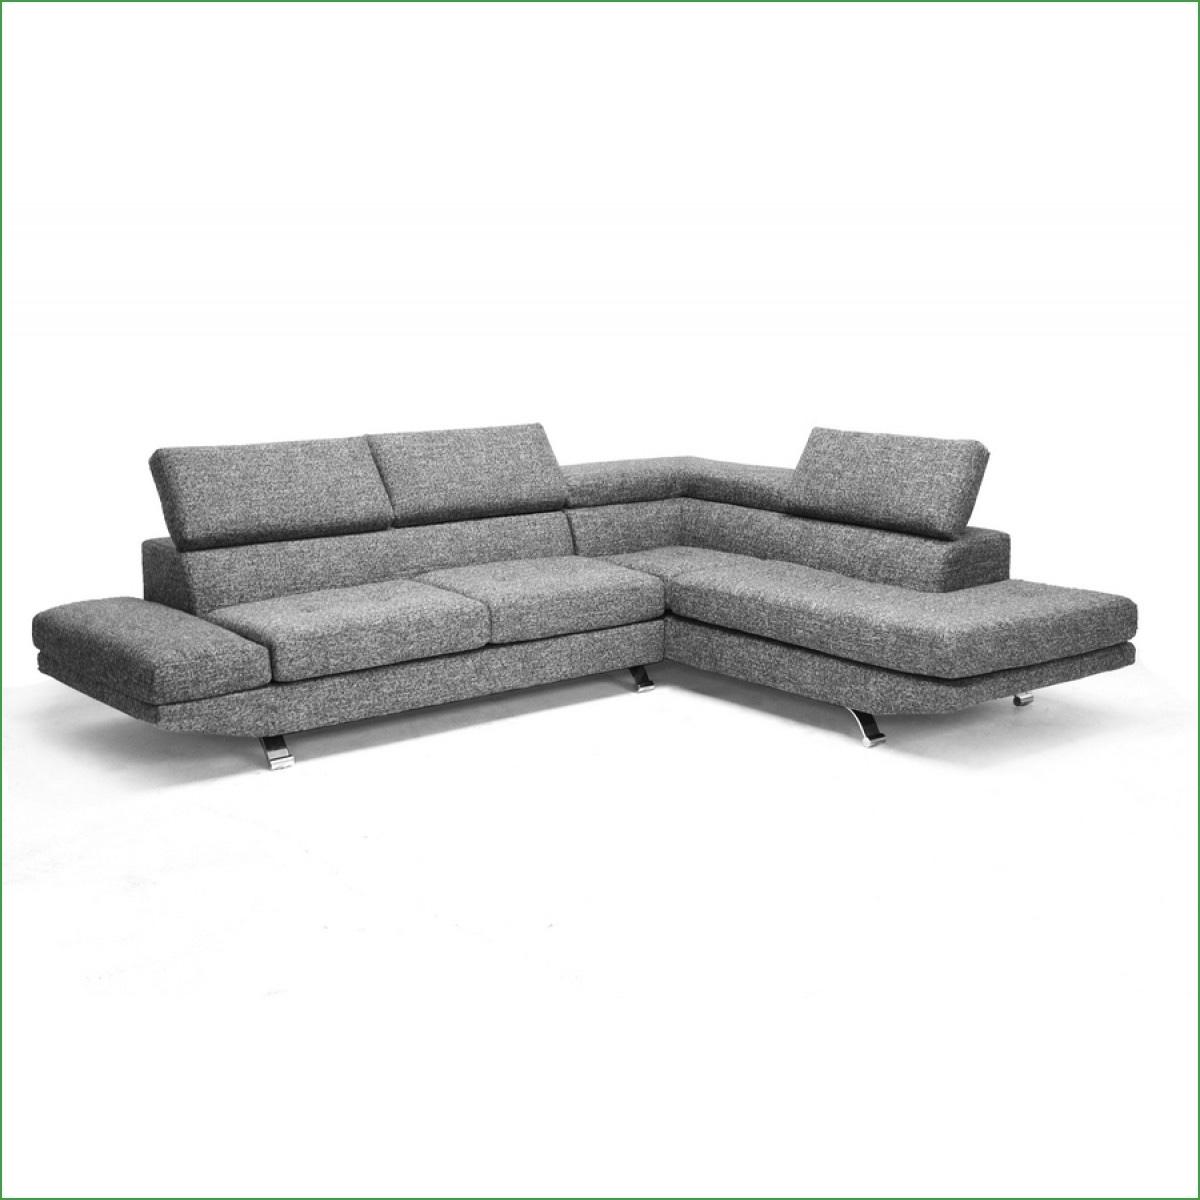 15 Photos Bentley Sectional Leather Sofa